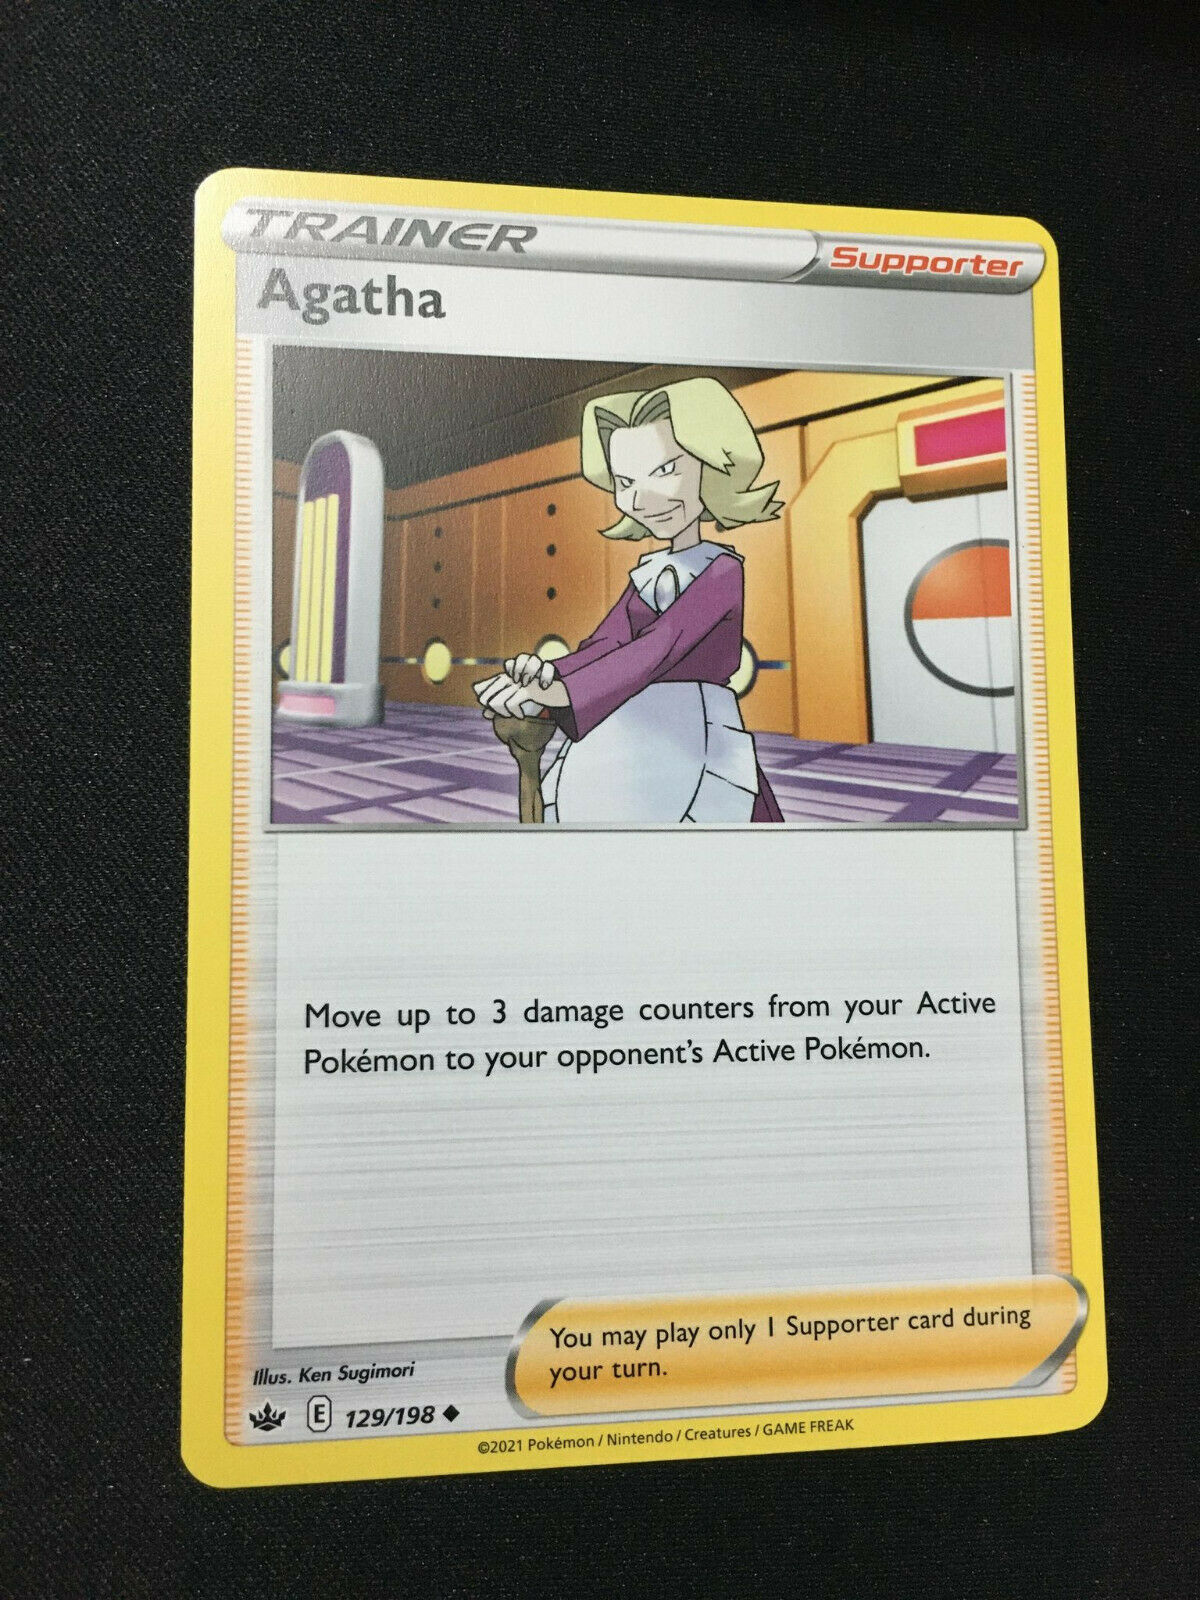 Pokemon TCG Agatha Trainer Card Chilling Reign SWSH06 129/198